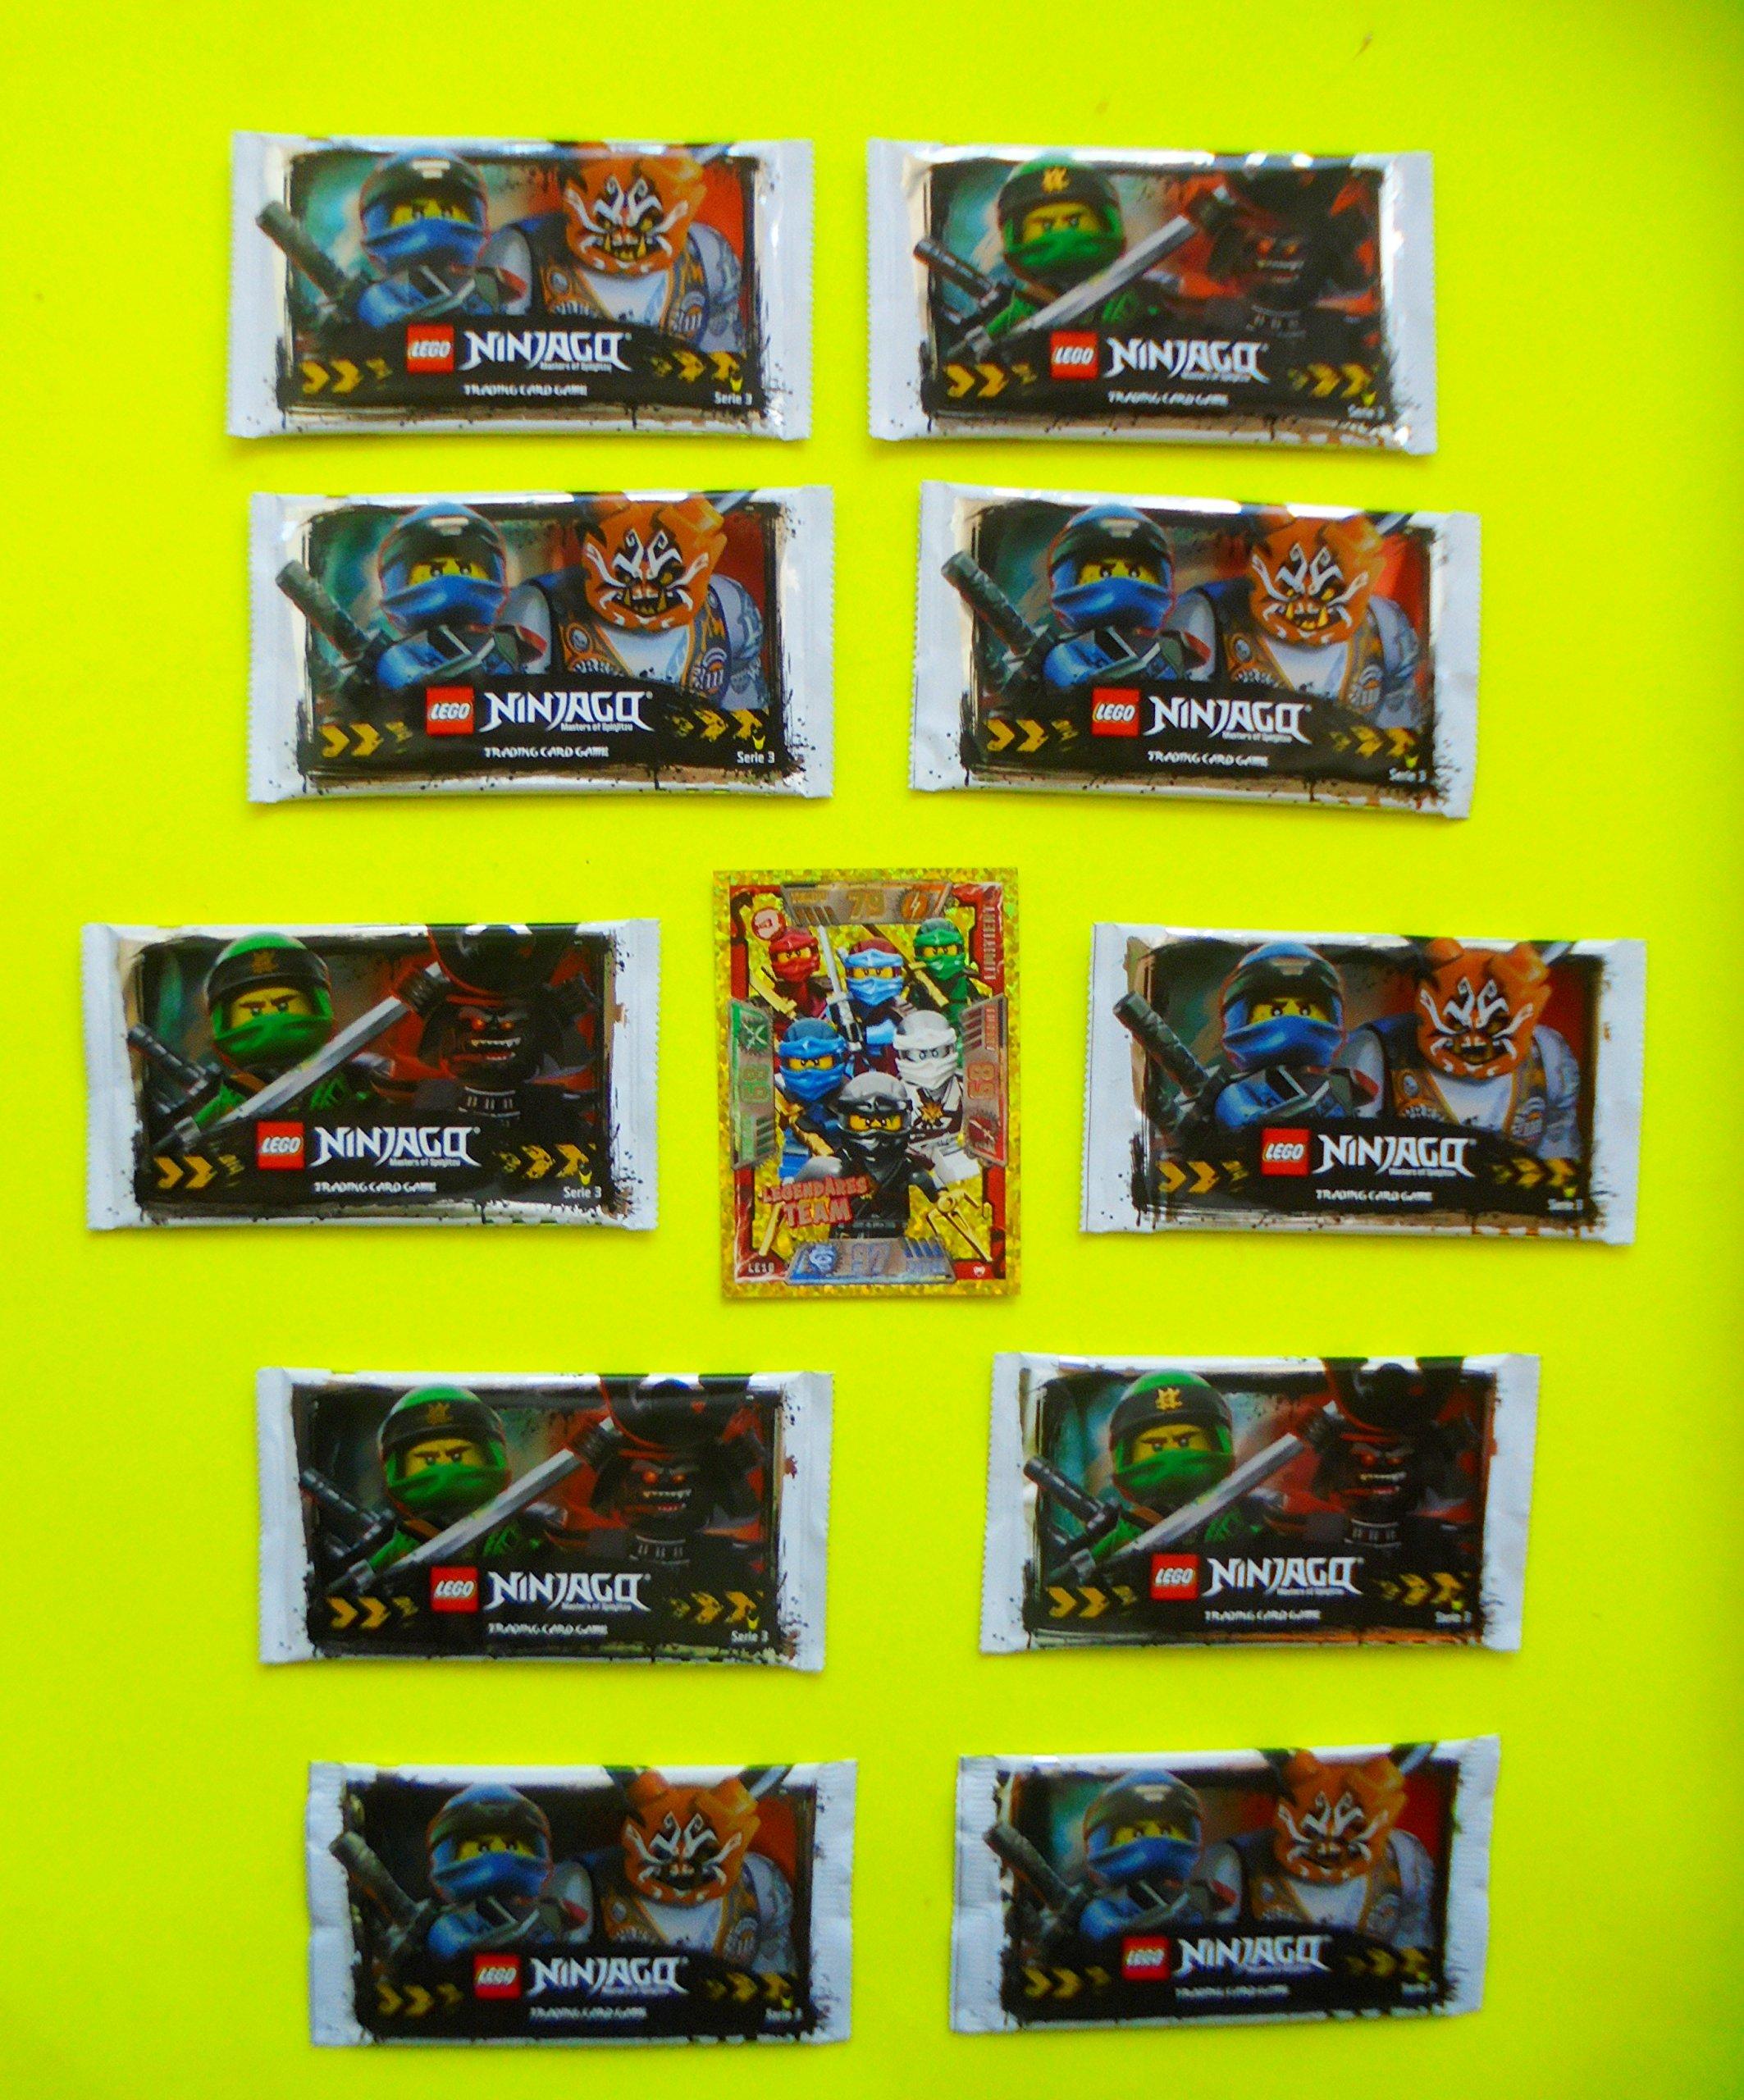 LEGO Ninjago Trading Cards Series 3 - 10 Packs x 5 Cards with Bonus Card Series 2 Legendary Team LE10 - GERMAN Edition